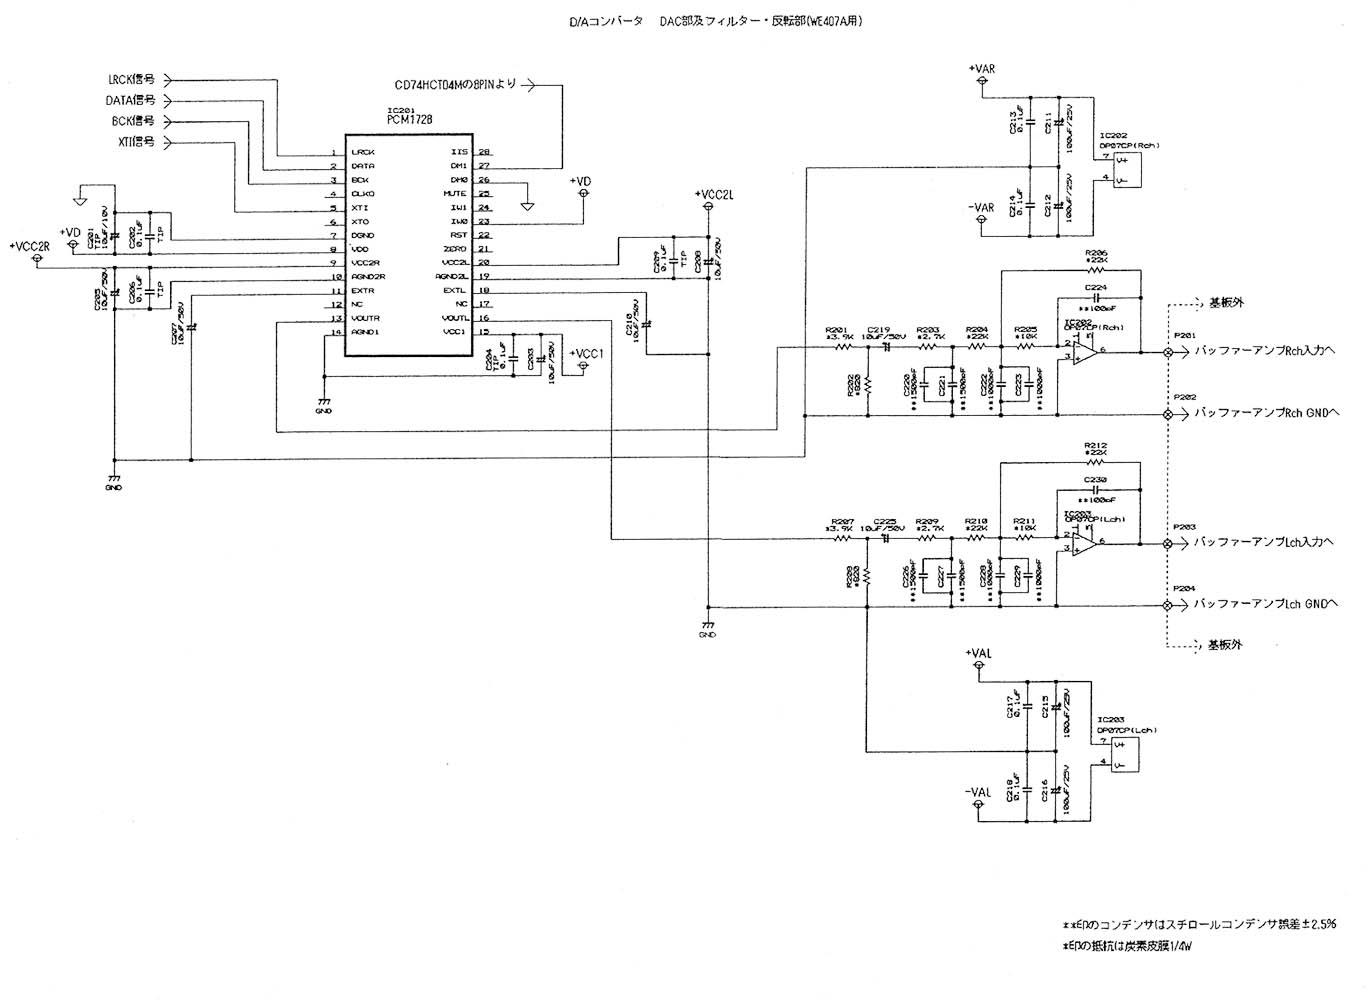 Eifl Original Da Converter With Tube Buffer D A Circuit Diagram 3dac Filter Section We407a